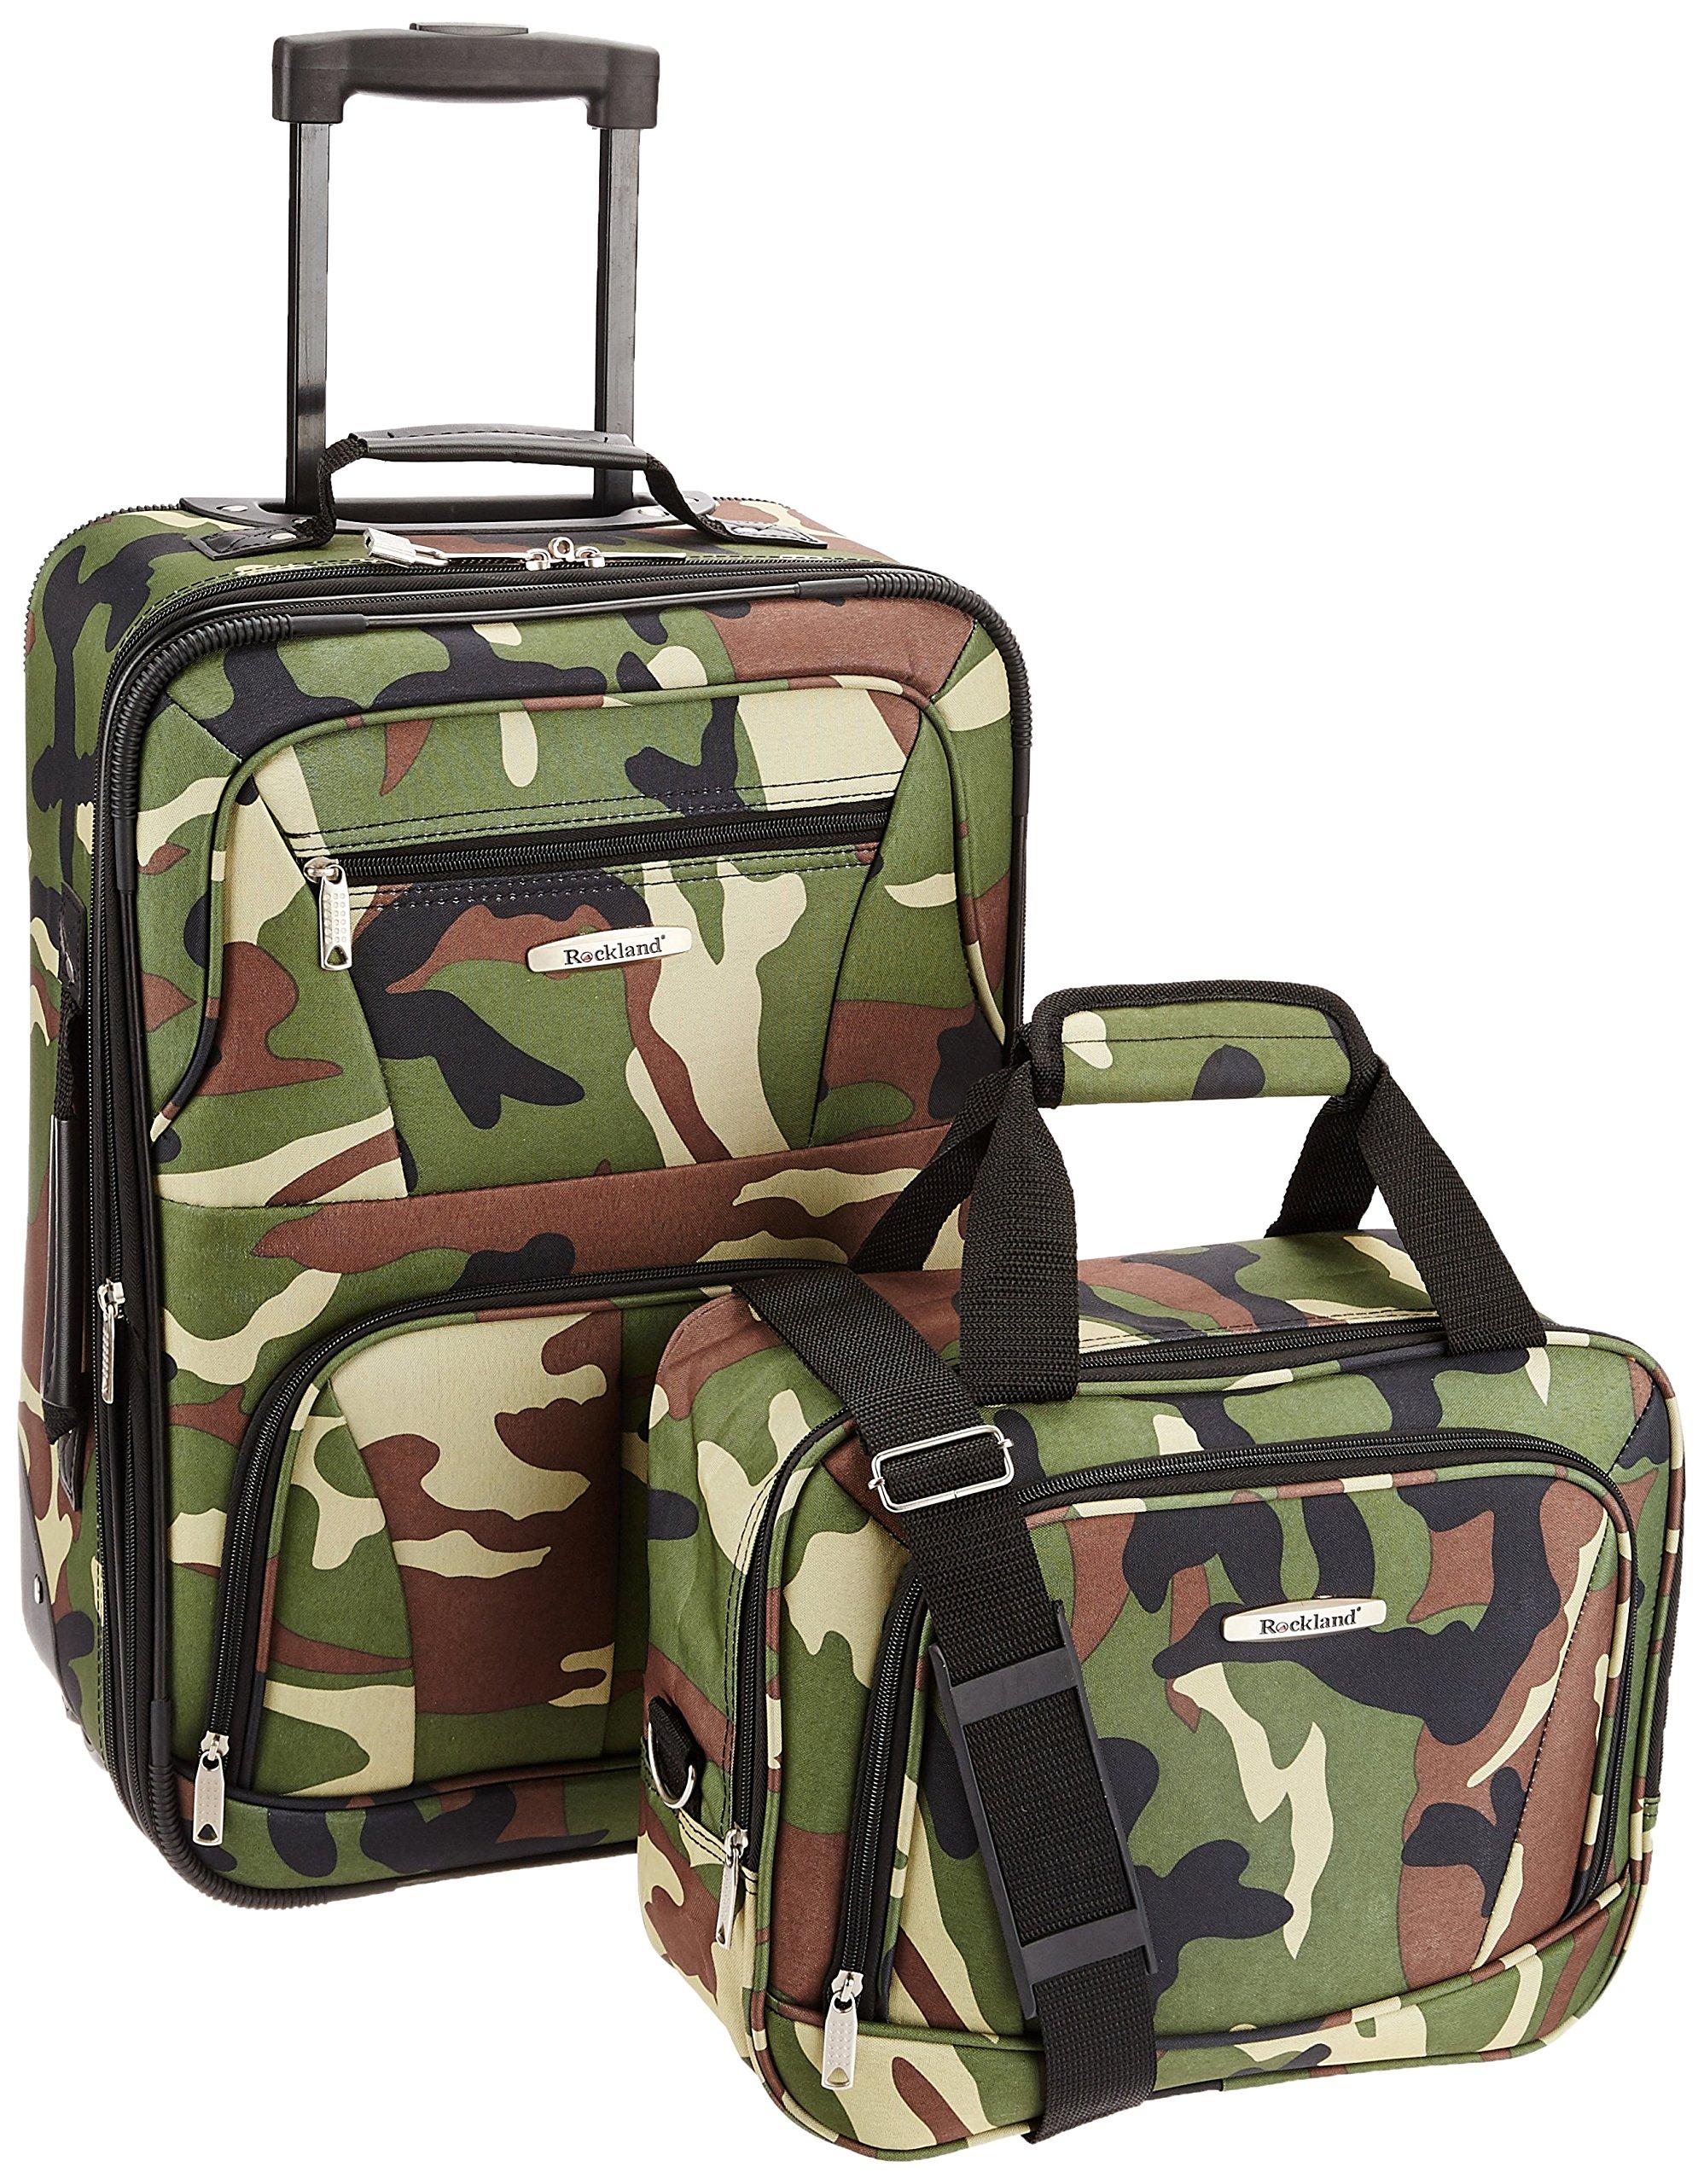 Rockland Luggage 2 Piece Printed Luggage Set, Camouflage, Medium by Rockland